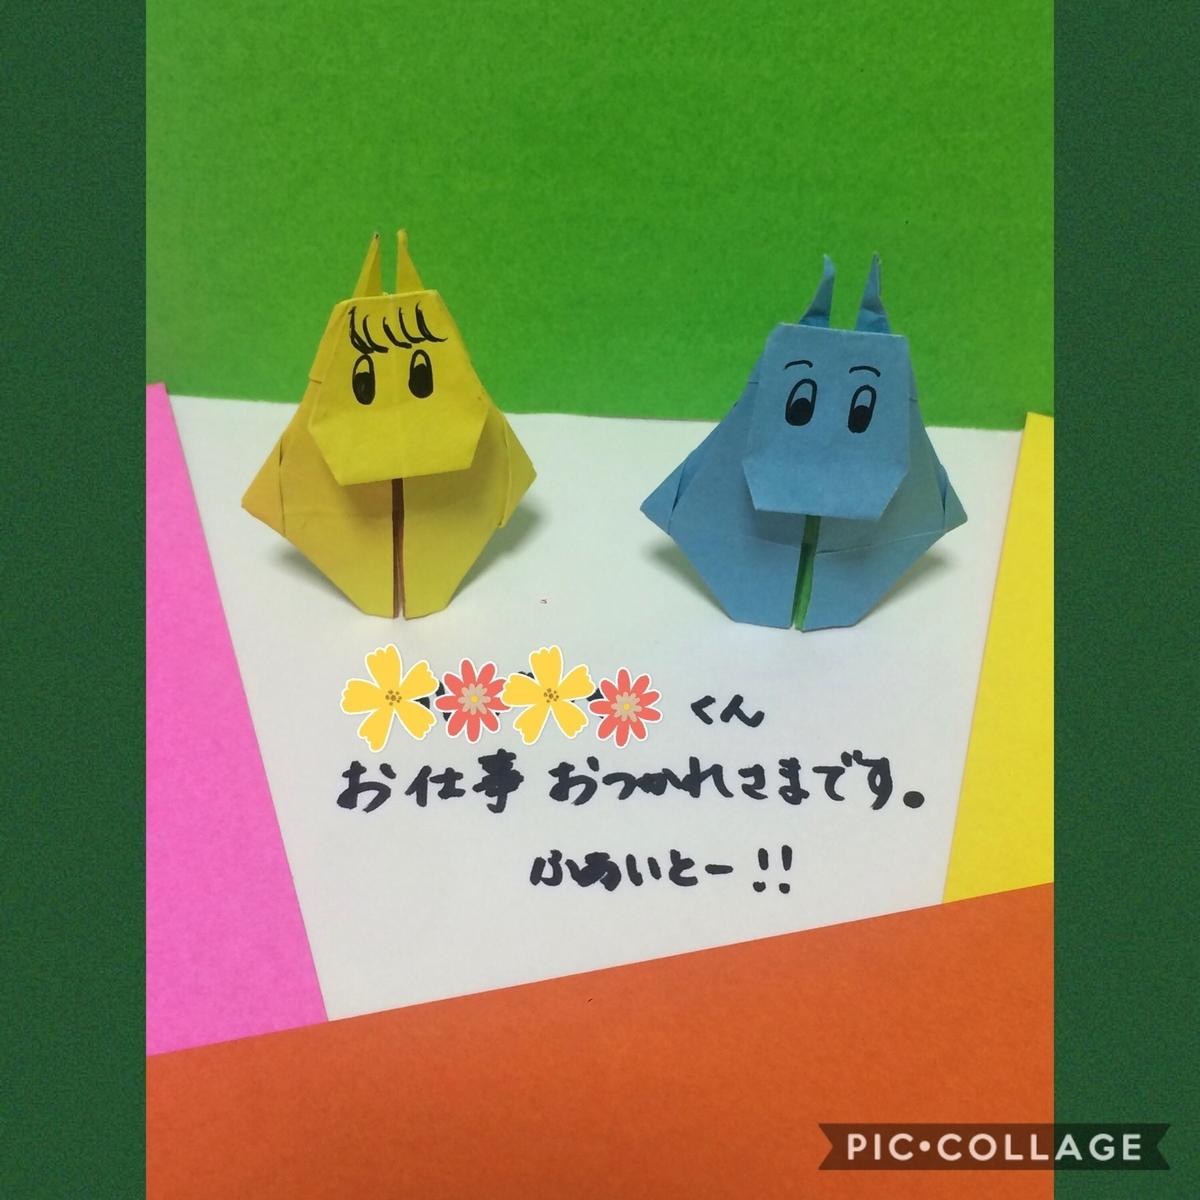 f:id:nanairo-r:20190913181052j:plain